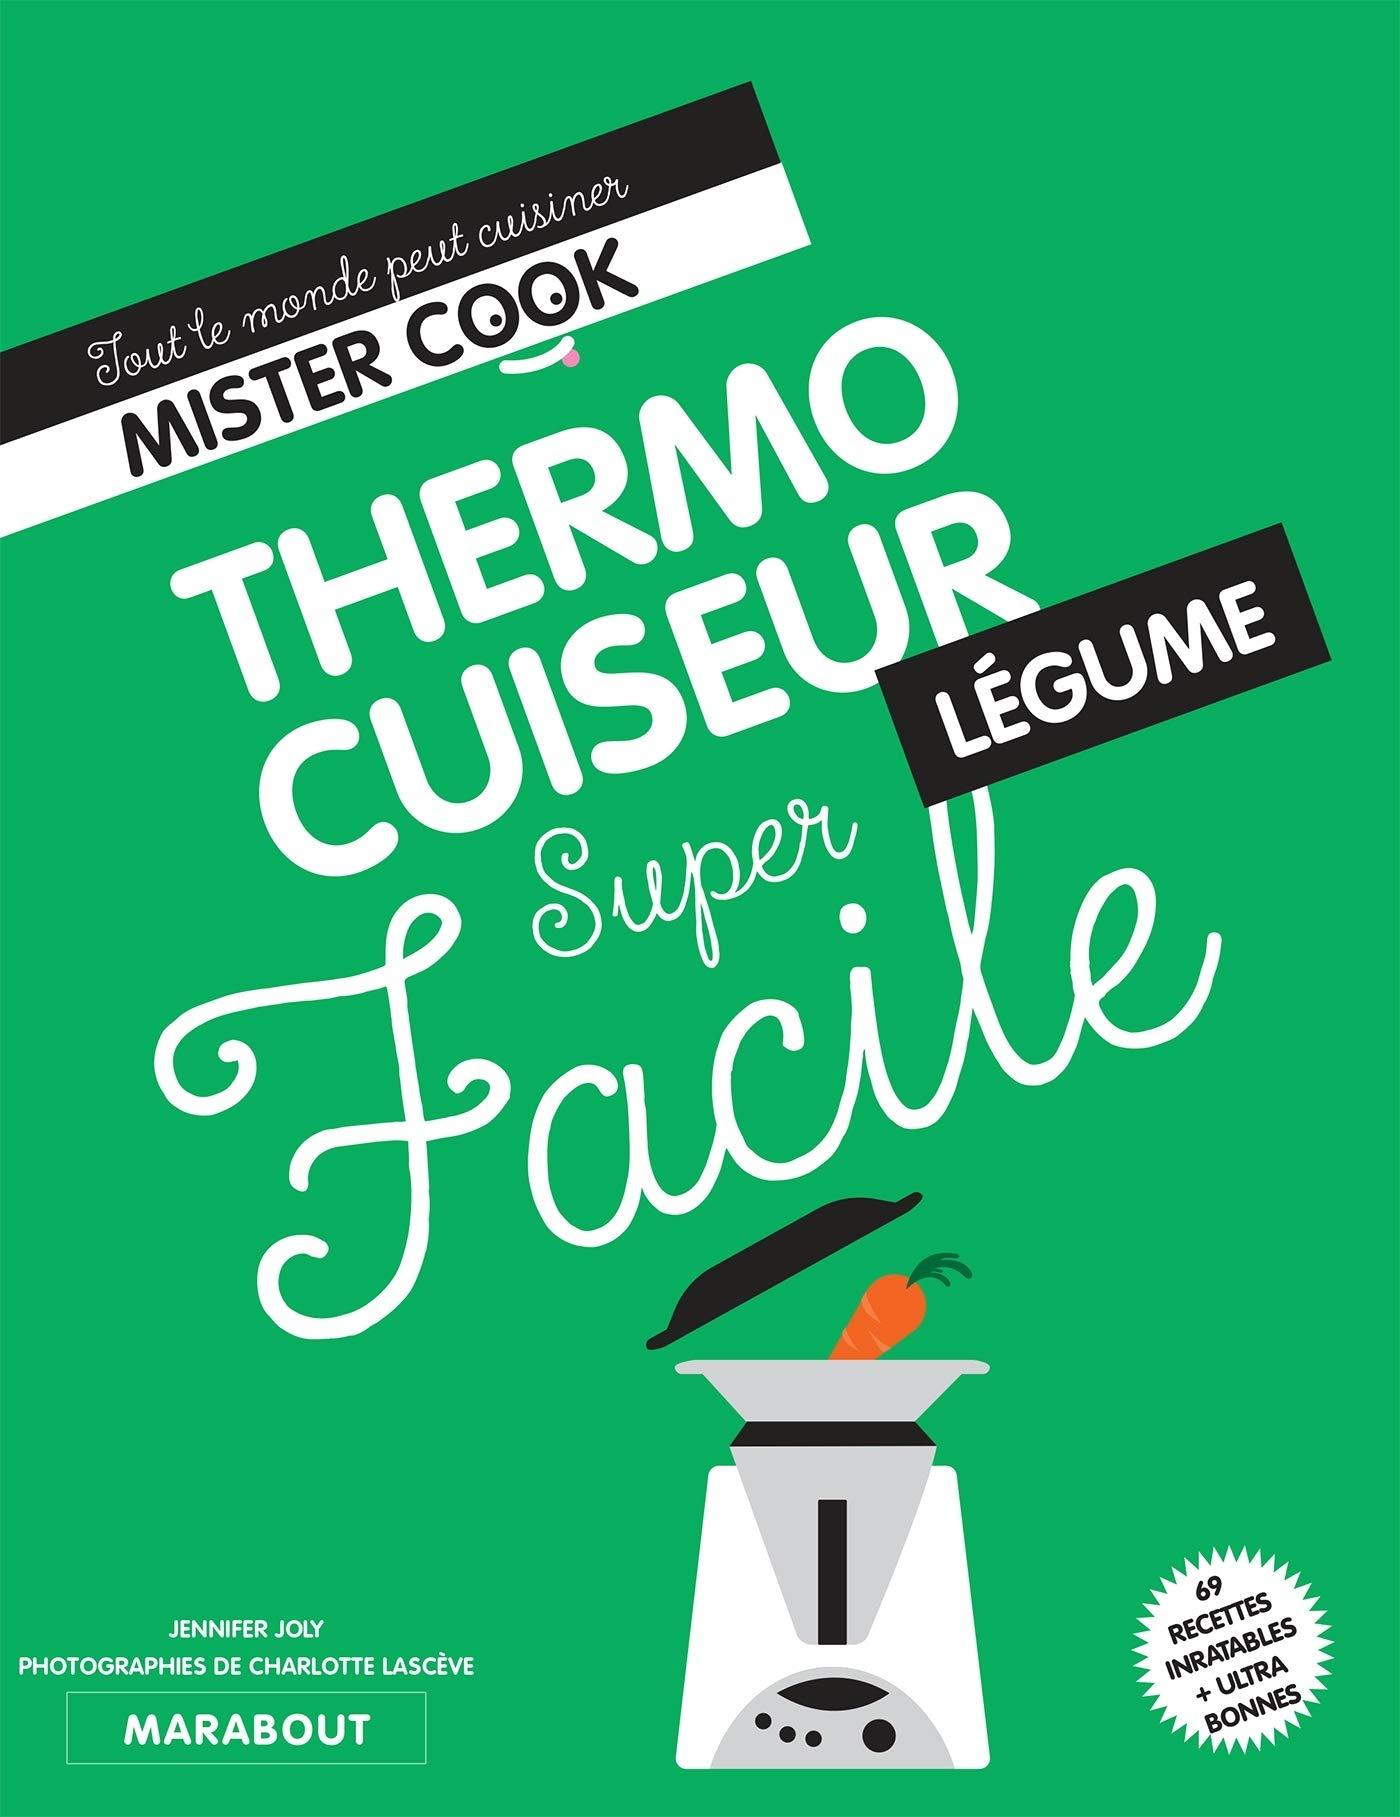 Super Facile : Thermocuiseur légumes (Cuisine): Amazon.es: Jennifer Joly: Libros en idiomas extranjeros